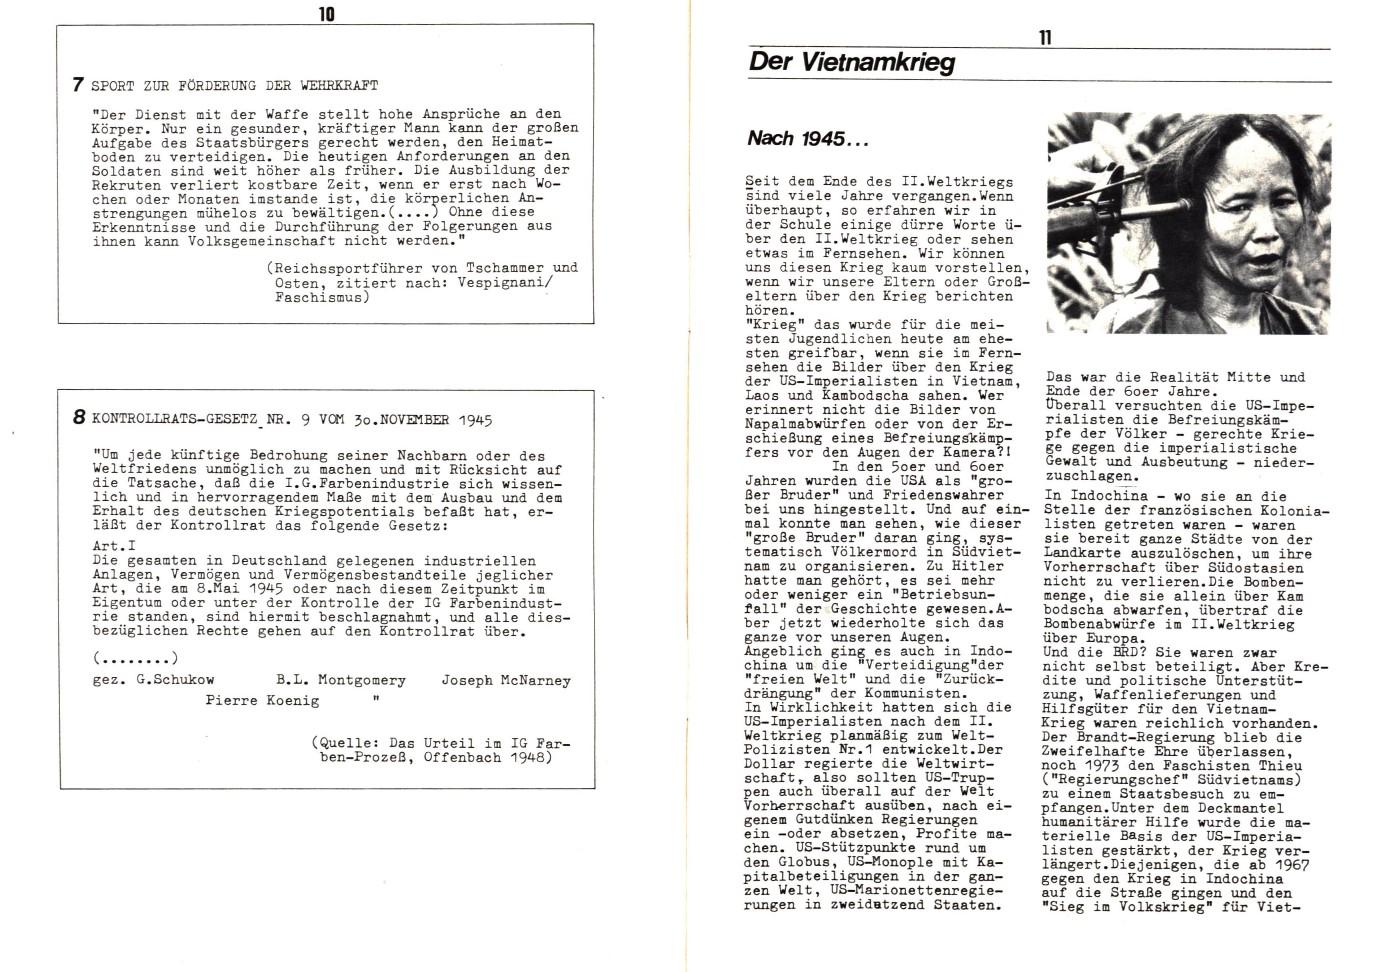 KJVD_1979_Dokumente_zum_Antikriegstag_07